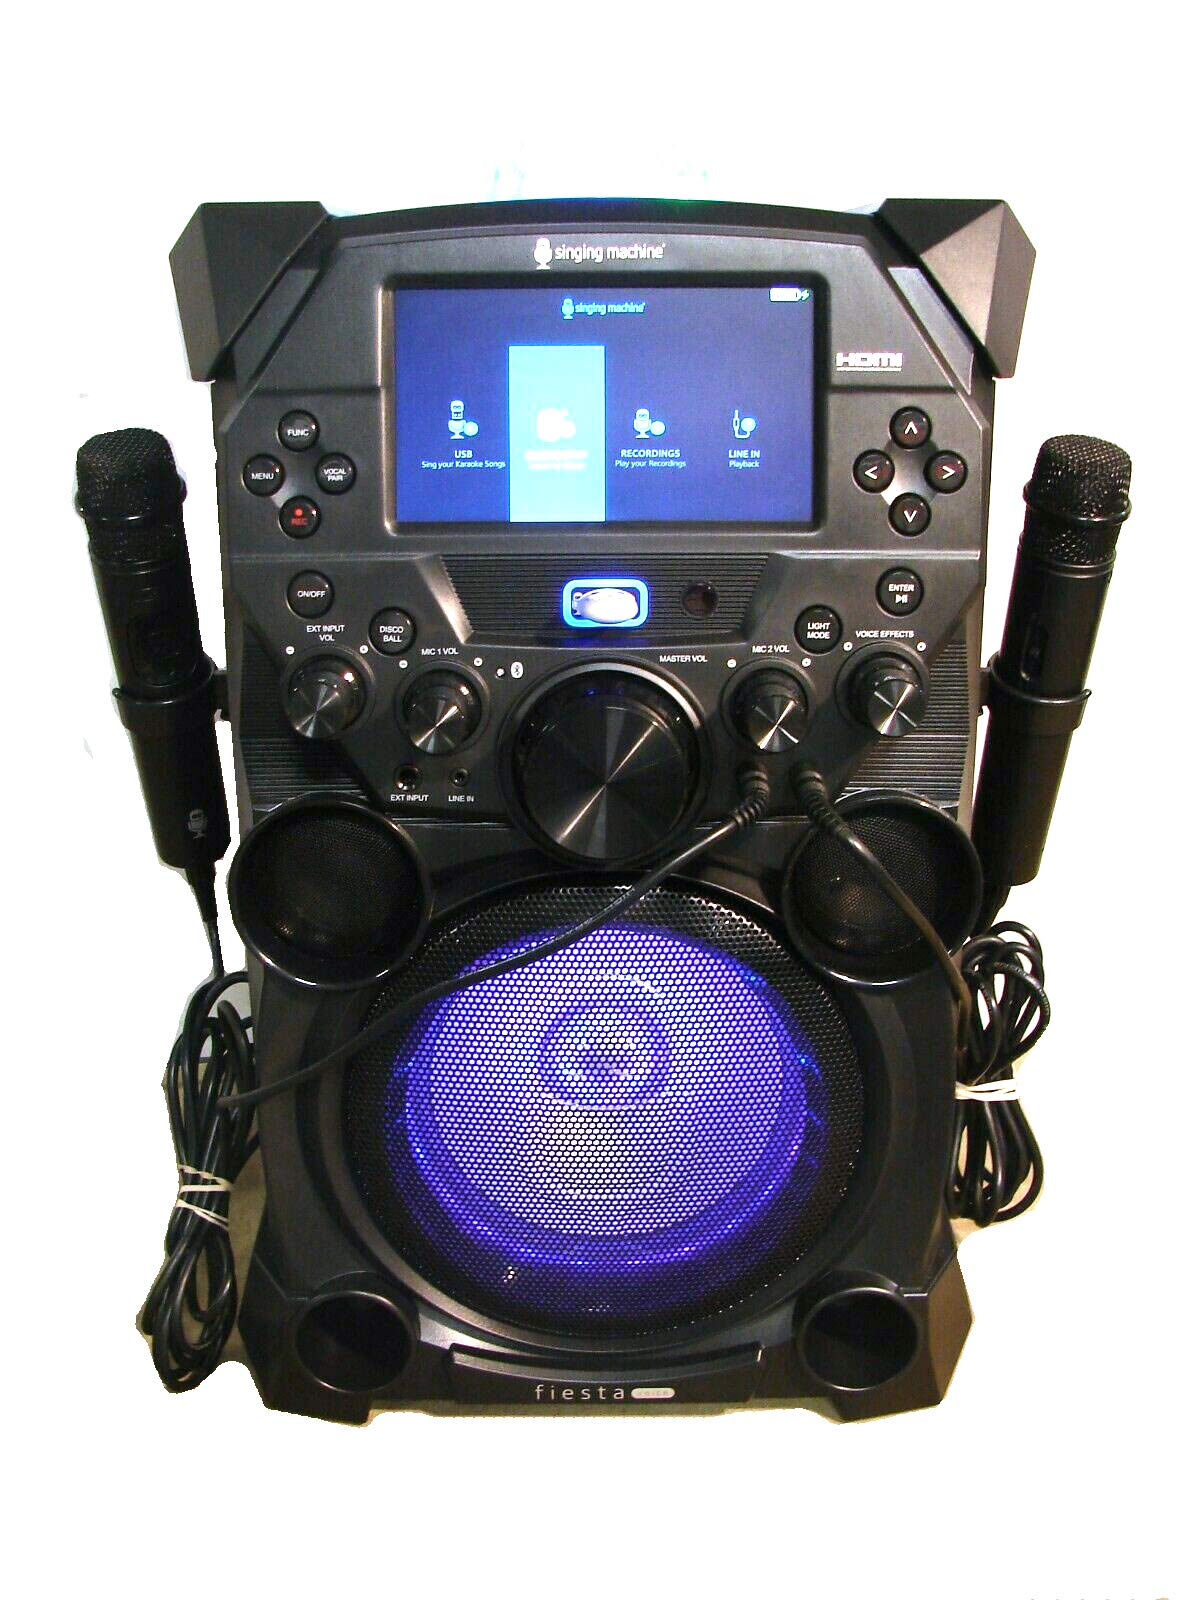 Amoldar 5inging Machine Fiest@ Voice Hi-Definition Karaoke System SDL9040 by Amoldar (Image #1)